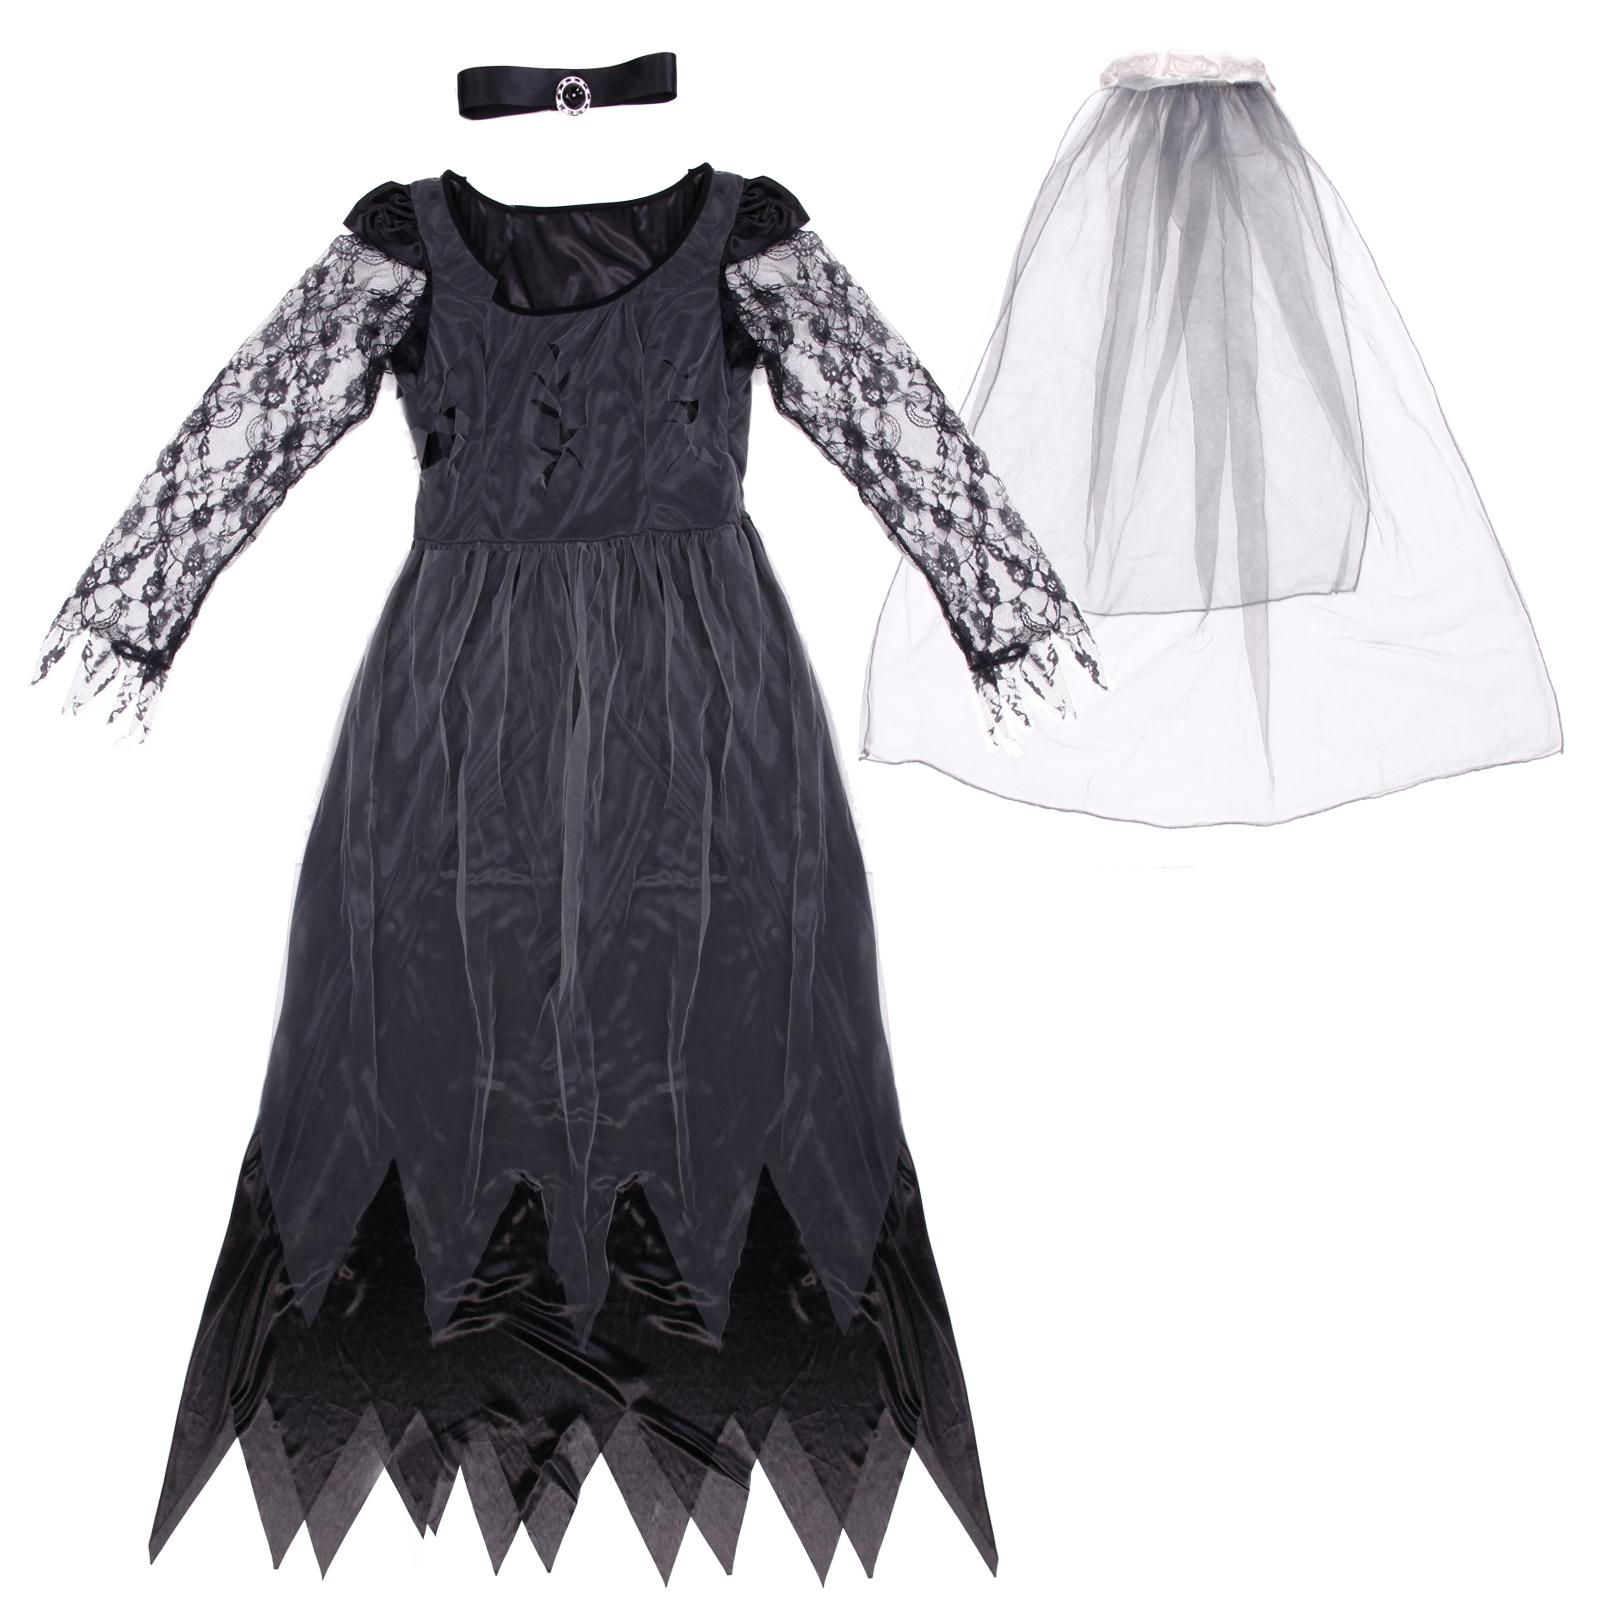 kost m karneval fasching verkleidung halloween zombie zombiekost m viele motive ebay. Black Bedroom Furniture Sets. Home Design Ideas